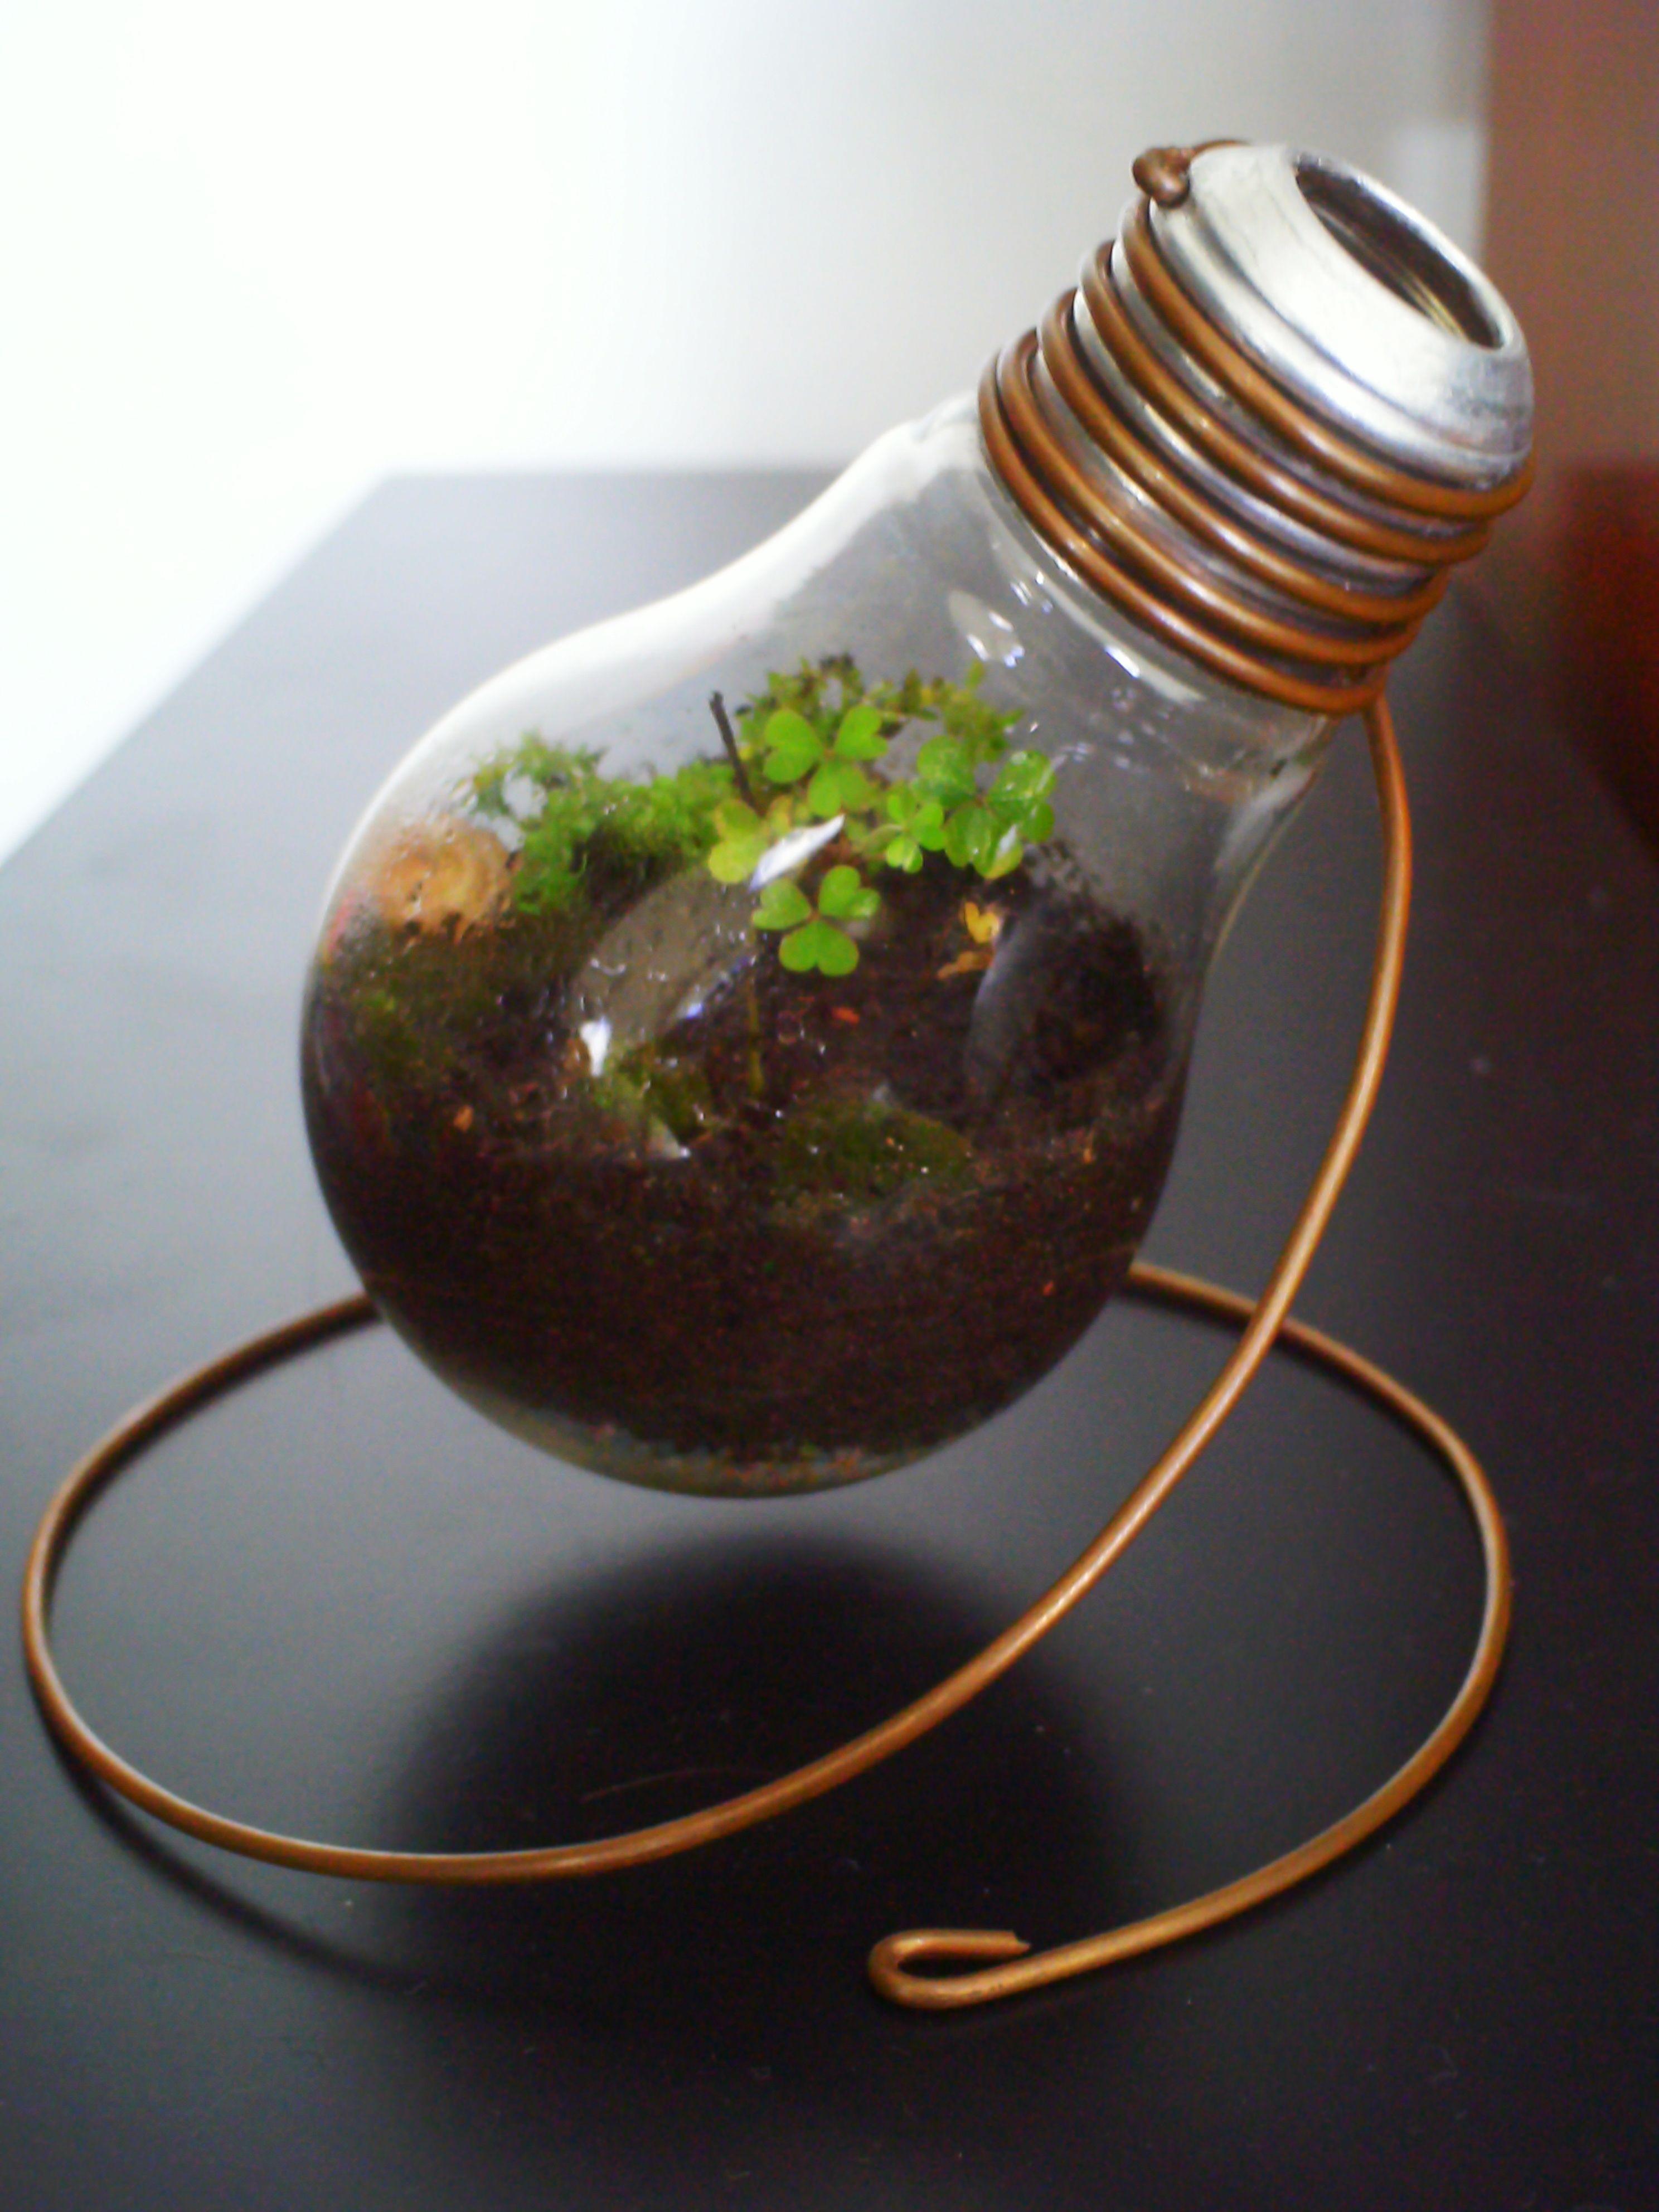 Light Bulb Terrarium Lijmpistool Knutselen Gloeilampen